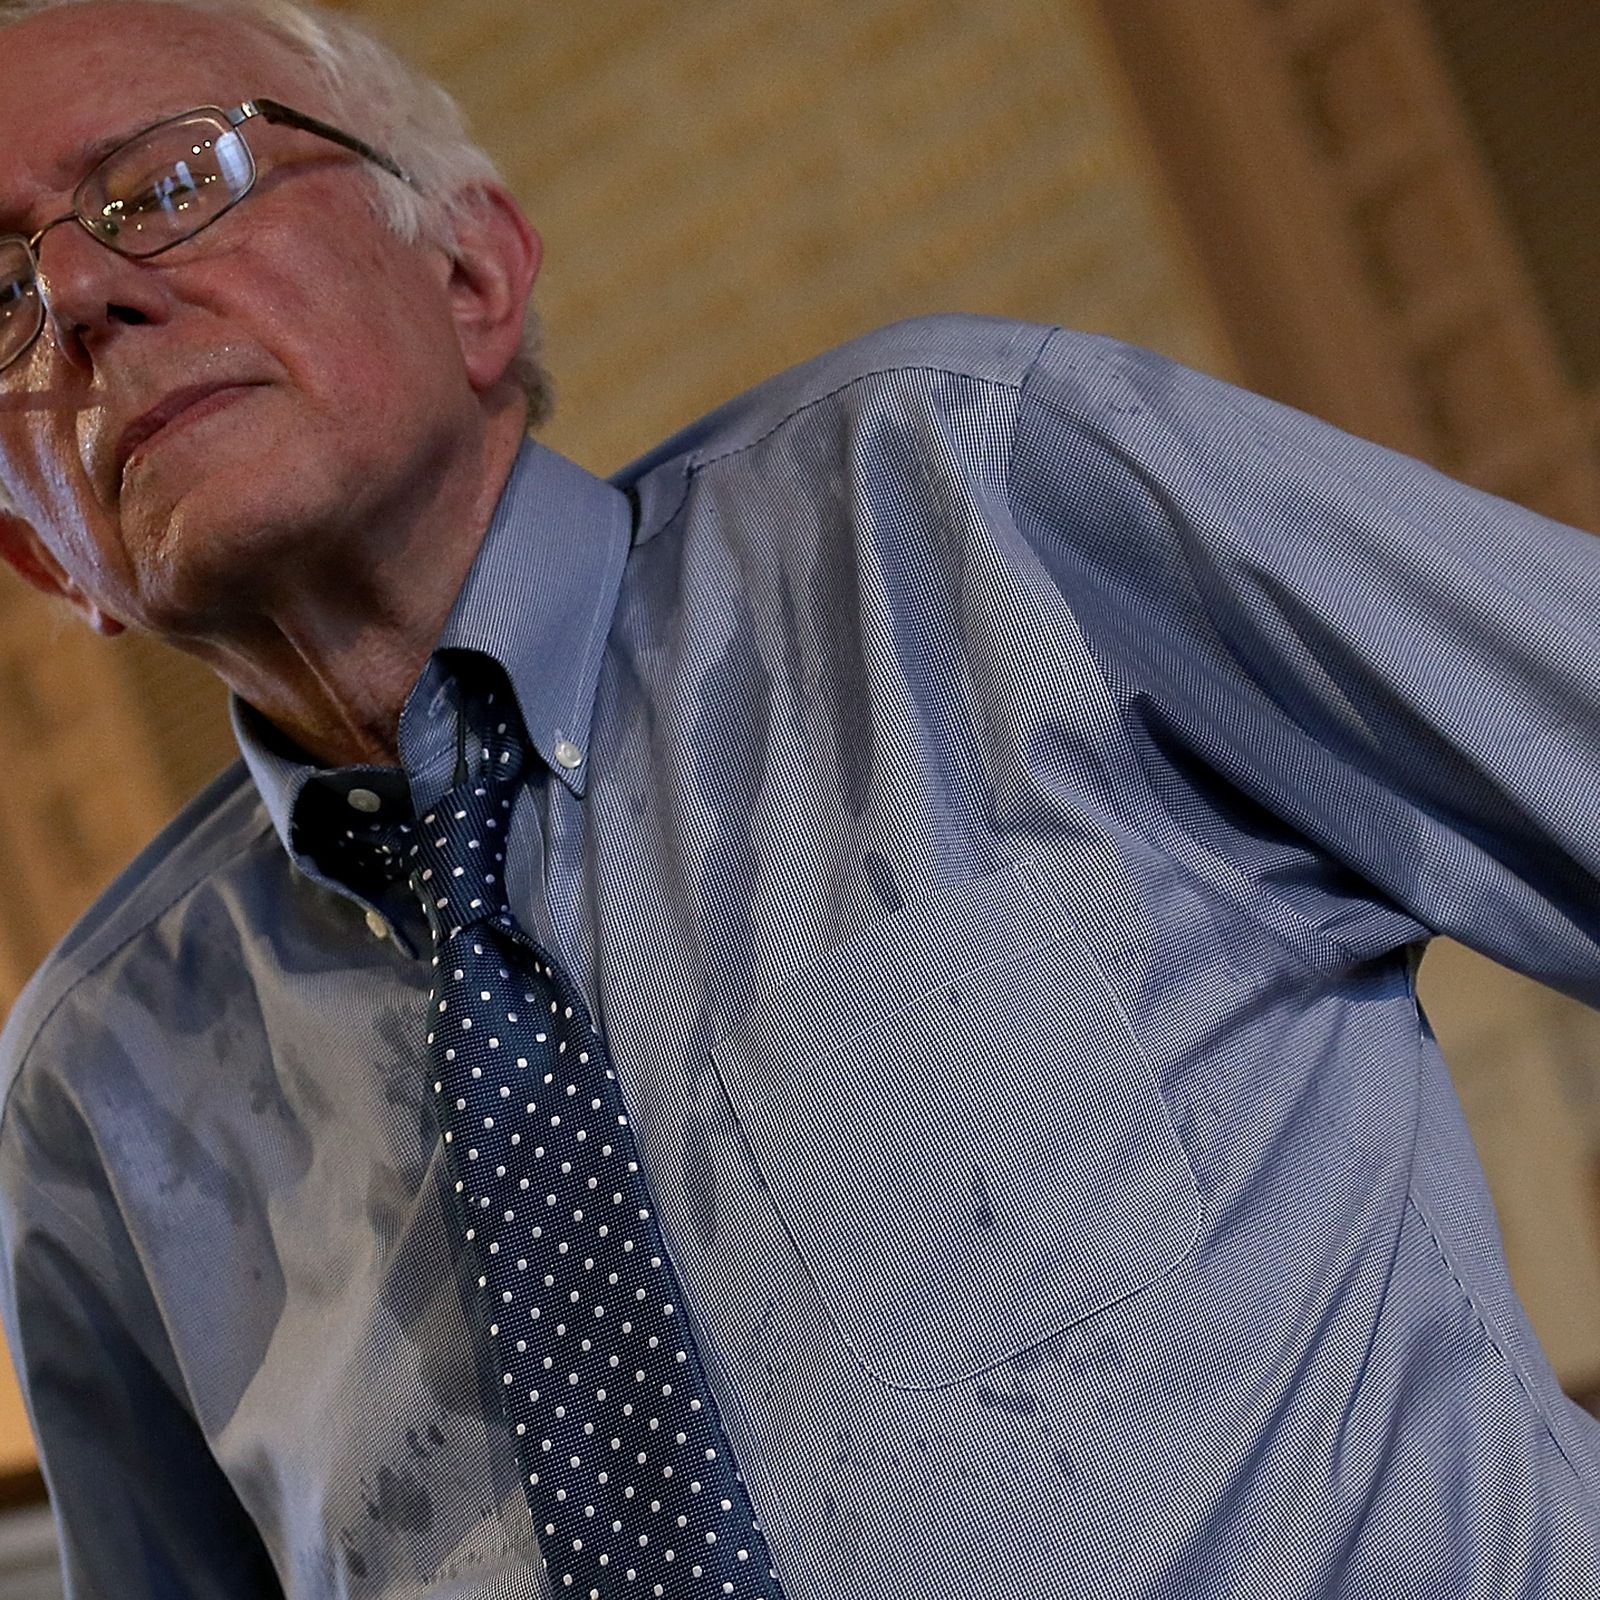 019 Mthiyzgymtbhyimvyvlec0r2znftukxsm193mkk2c3hbs3banlpfps83odn4mty1ojiymtd4mtu5os8xnjawede2mdavzmlsdgvyczpmb3jtyxqoanblzyk6cxvhbgl0esg4mckvahr0chm6ly9zmy5hbwf6b25hd3muy29tl3bvbgljew1pyy1pbwfnzxmvnxntehgx Phenomenal Bernie Sanders Rape Essay Full